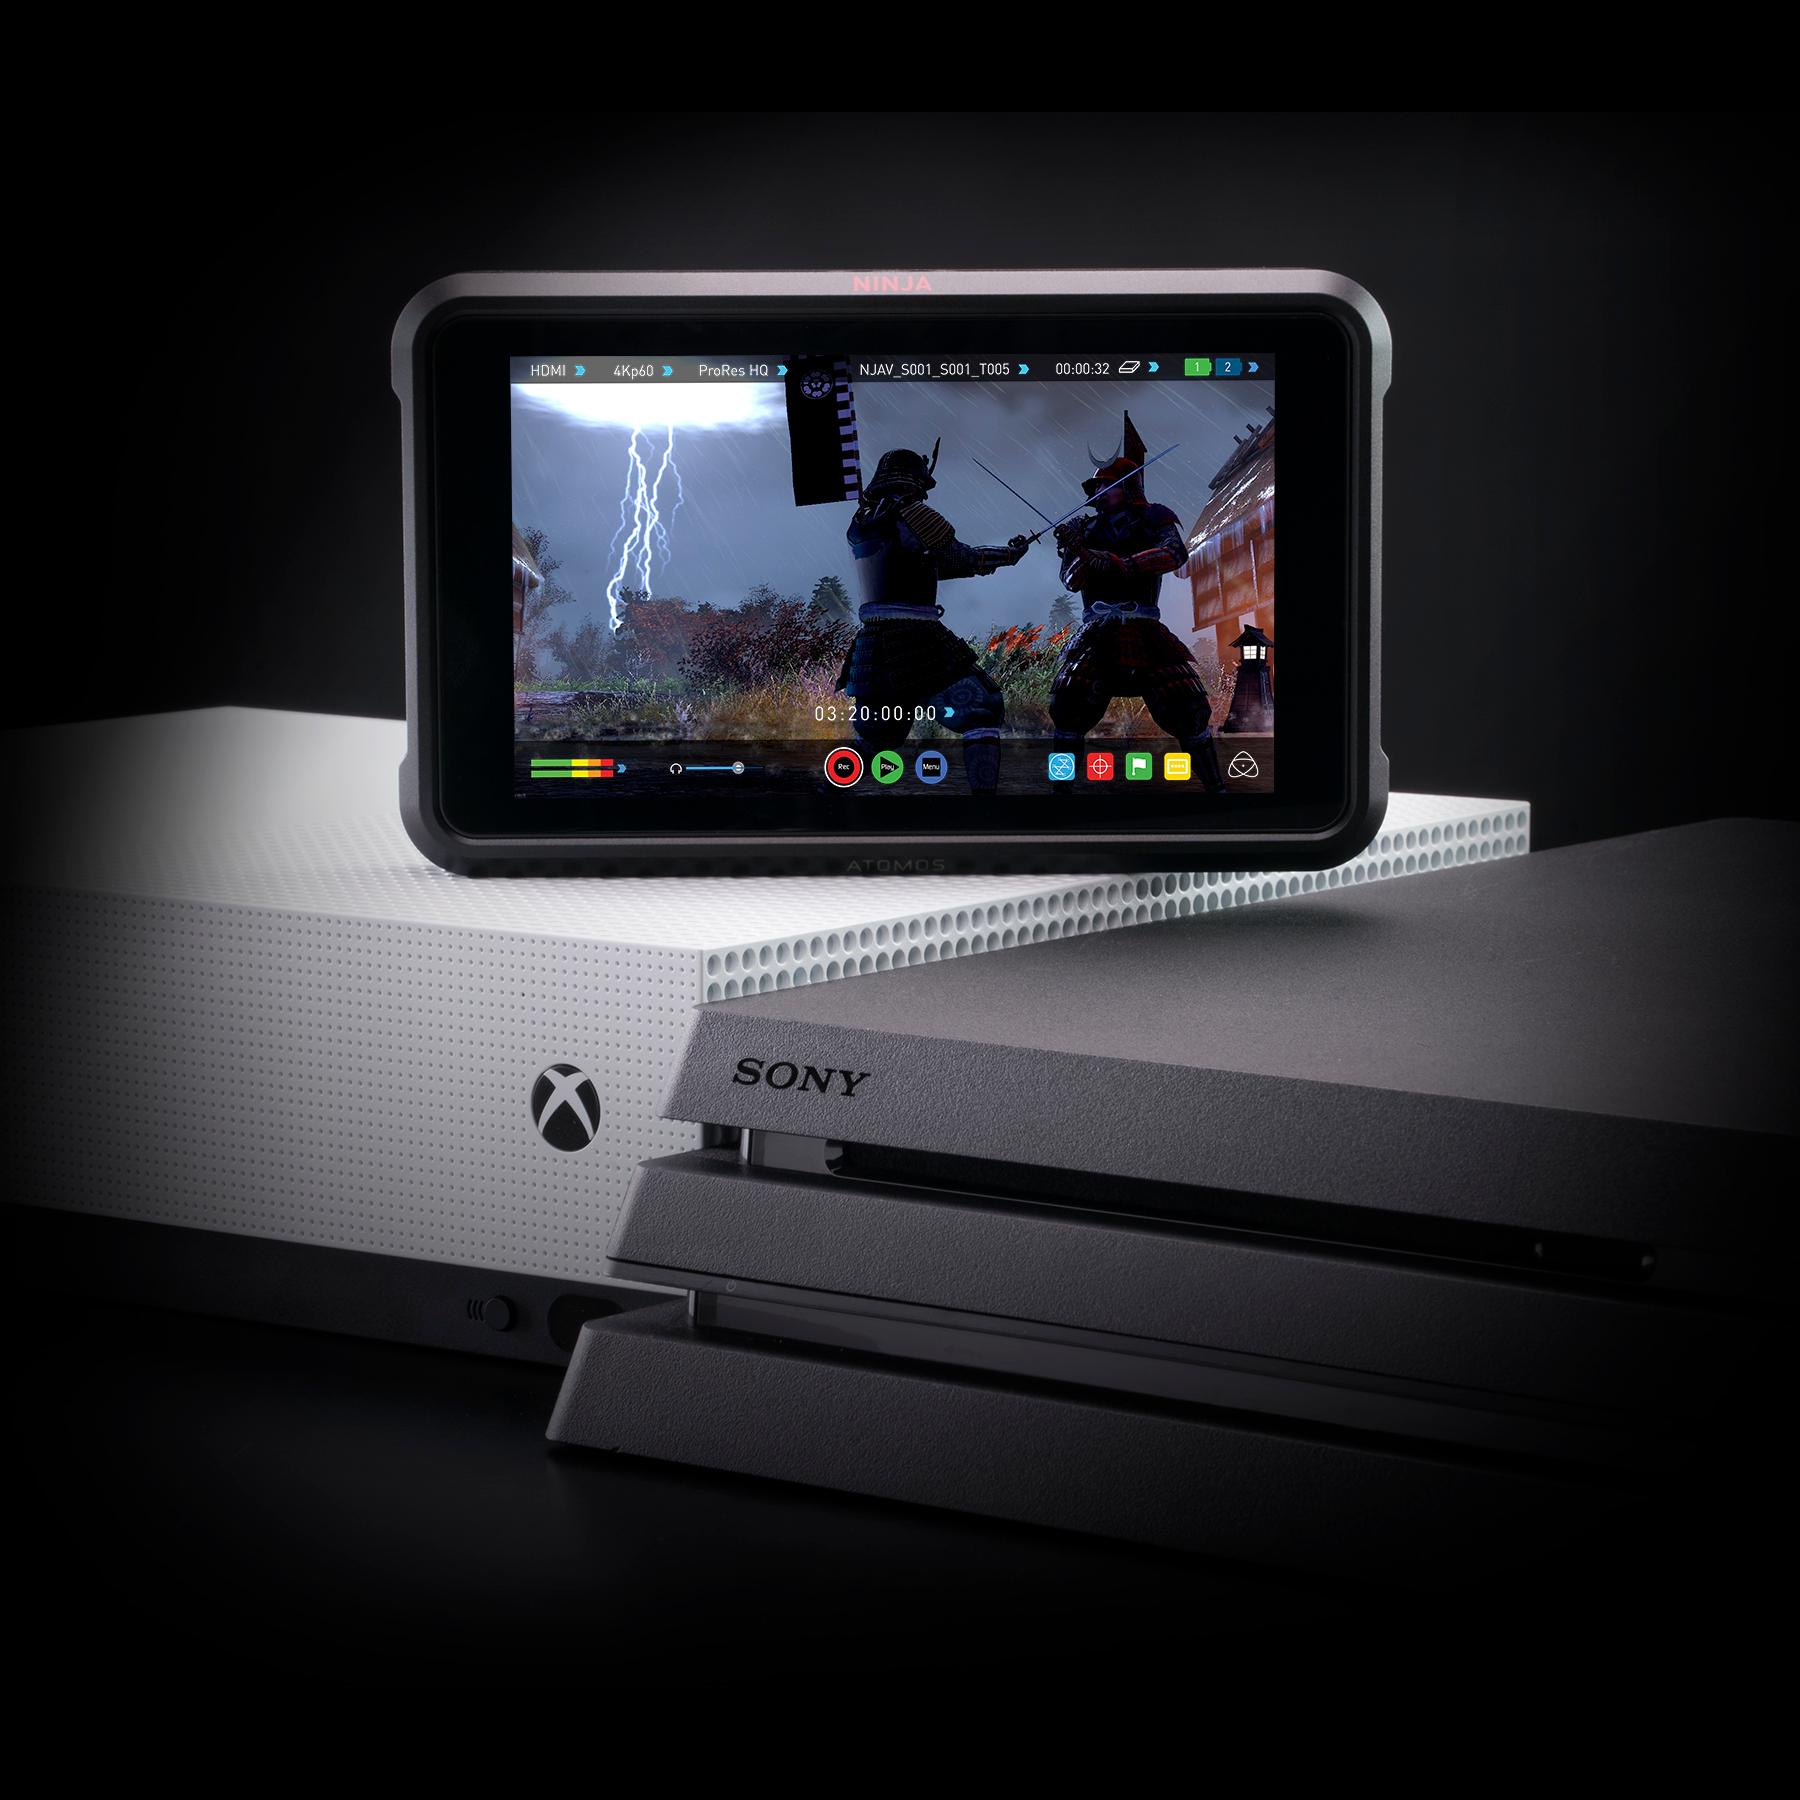 Atomos Ninja V 4Kp60 10bit HDR Daylight Viewable 1000nit Portable Monitor/Recorder - additional image 4